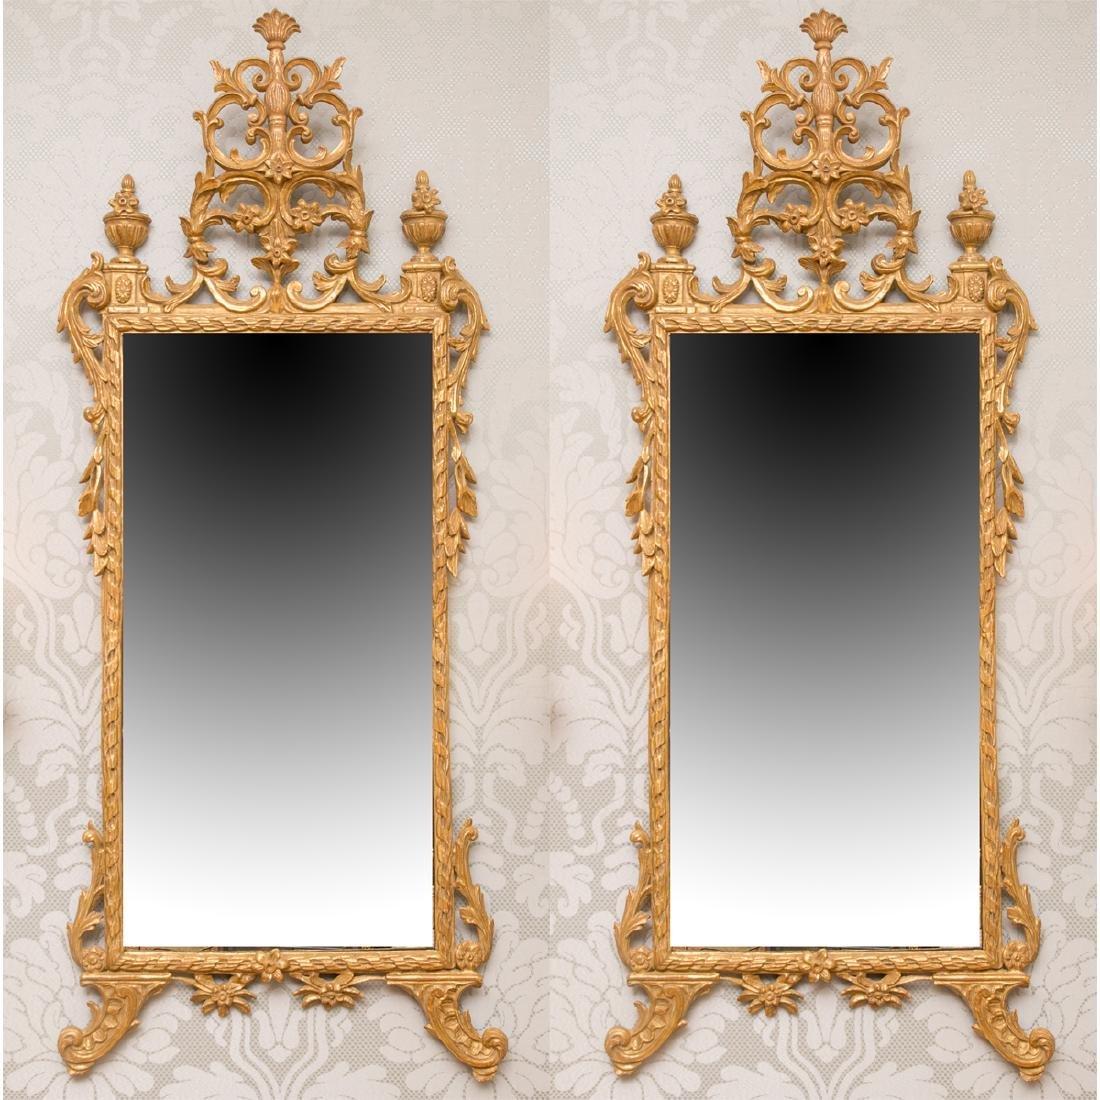 Pair of Italian Pier Mirrors